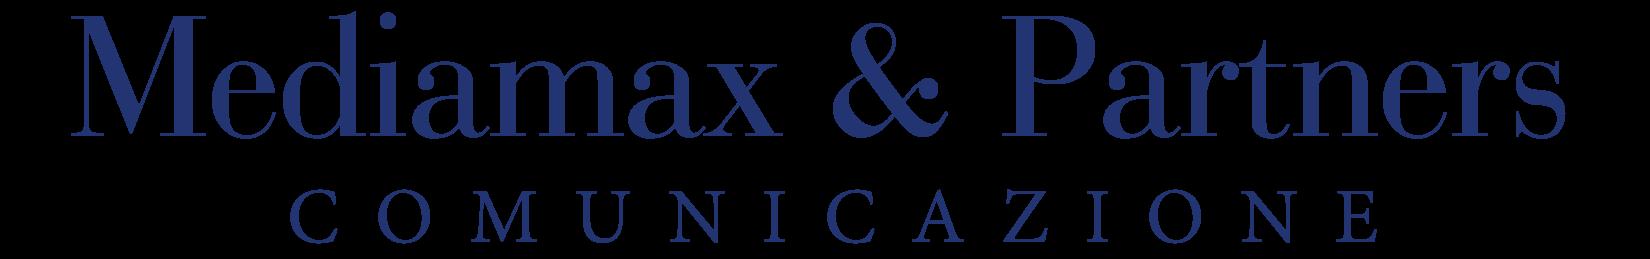 Mediamax & Partners